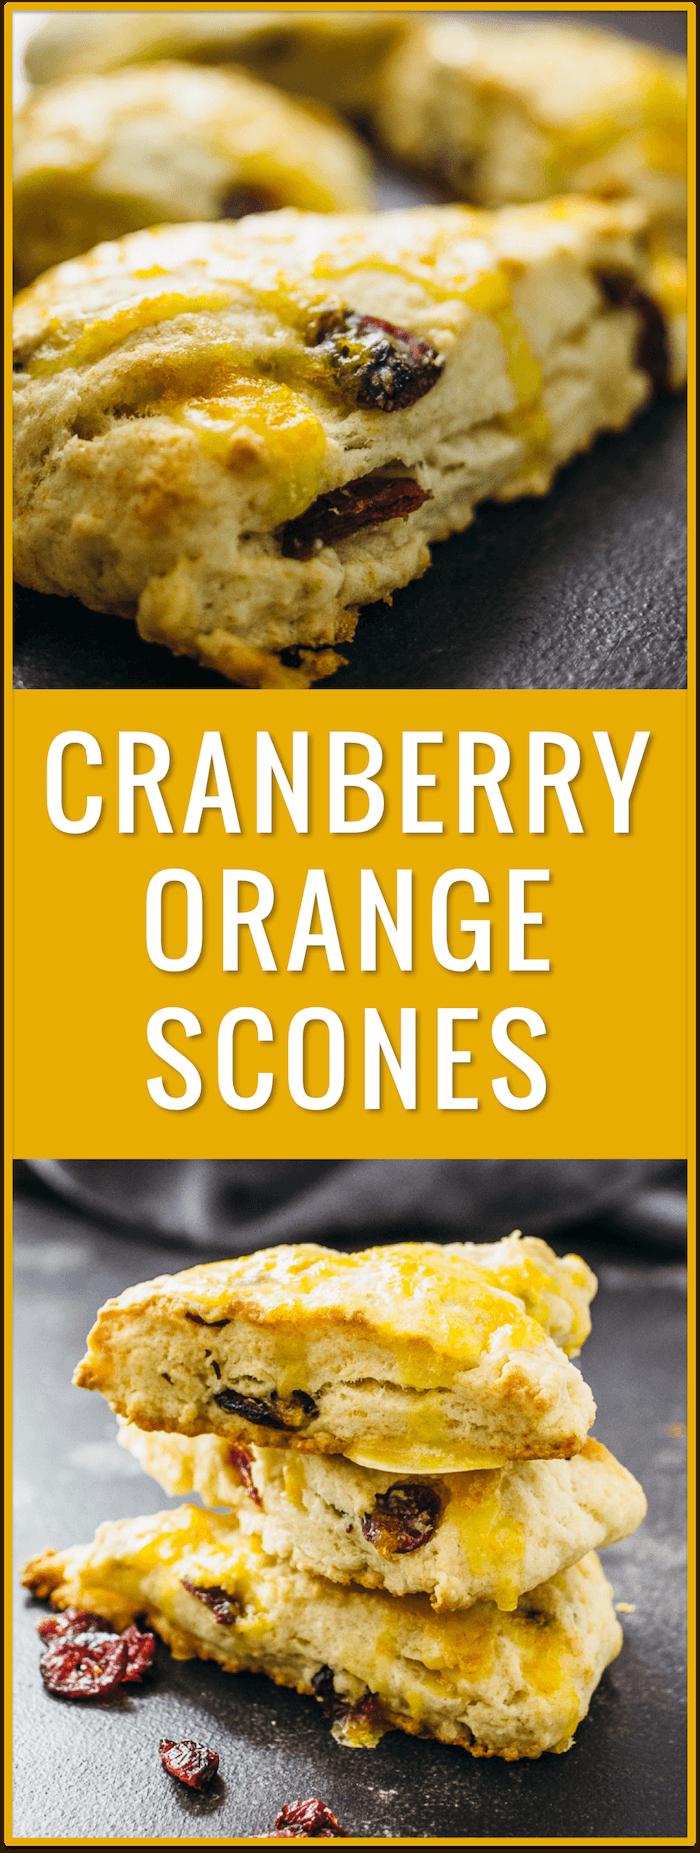 best cranberry orange scones, healthy, fresh fruit, baked, orange zest, orange glaze, thanksgiving, christmas, breakfast, brunch, morning, pastry, dessert